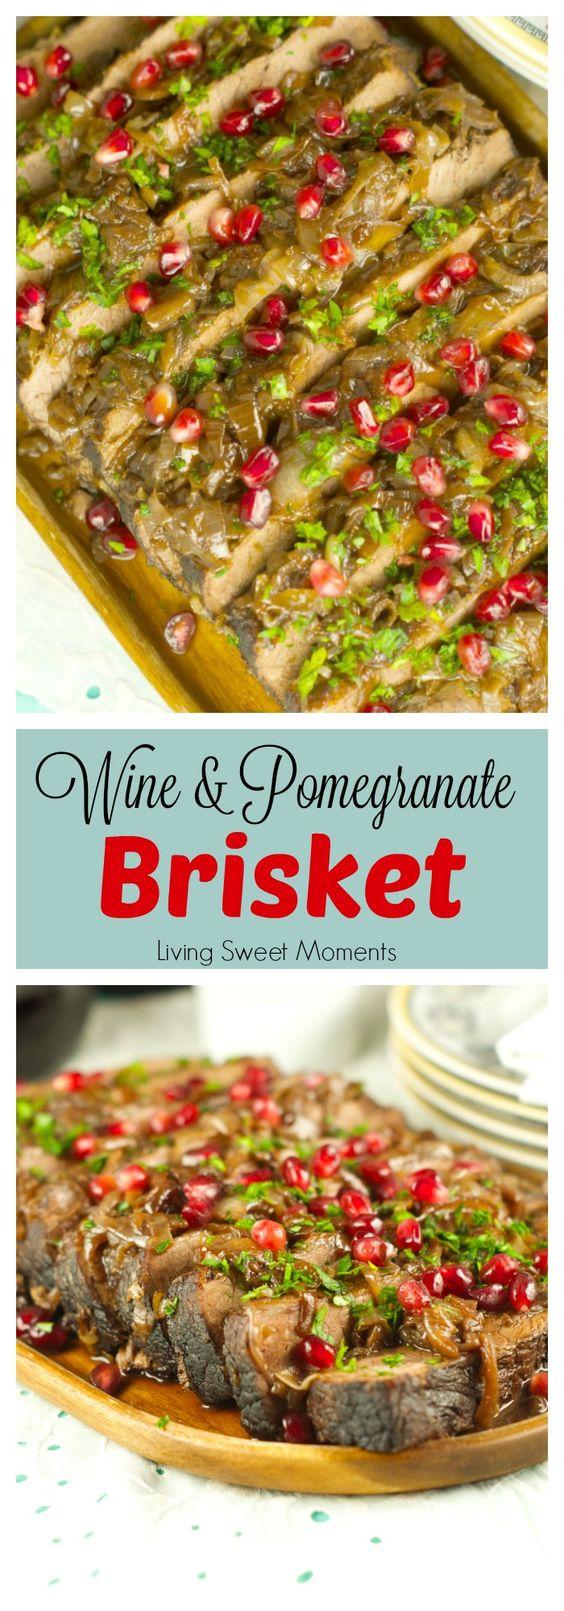 Wine And Pomegranate Brisket Recipe: delicious braised brisket with a ...